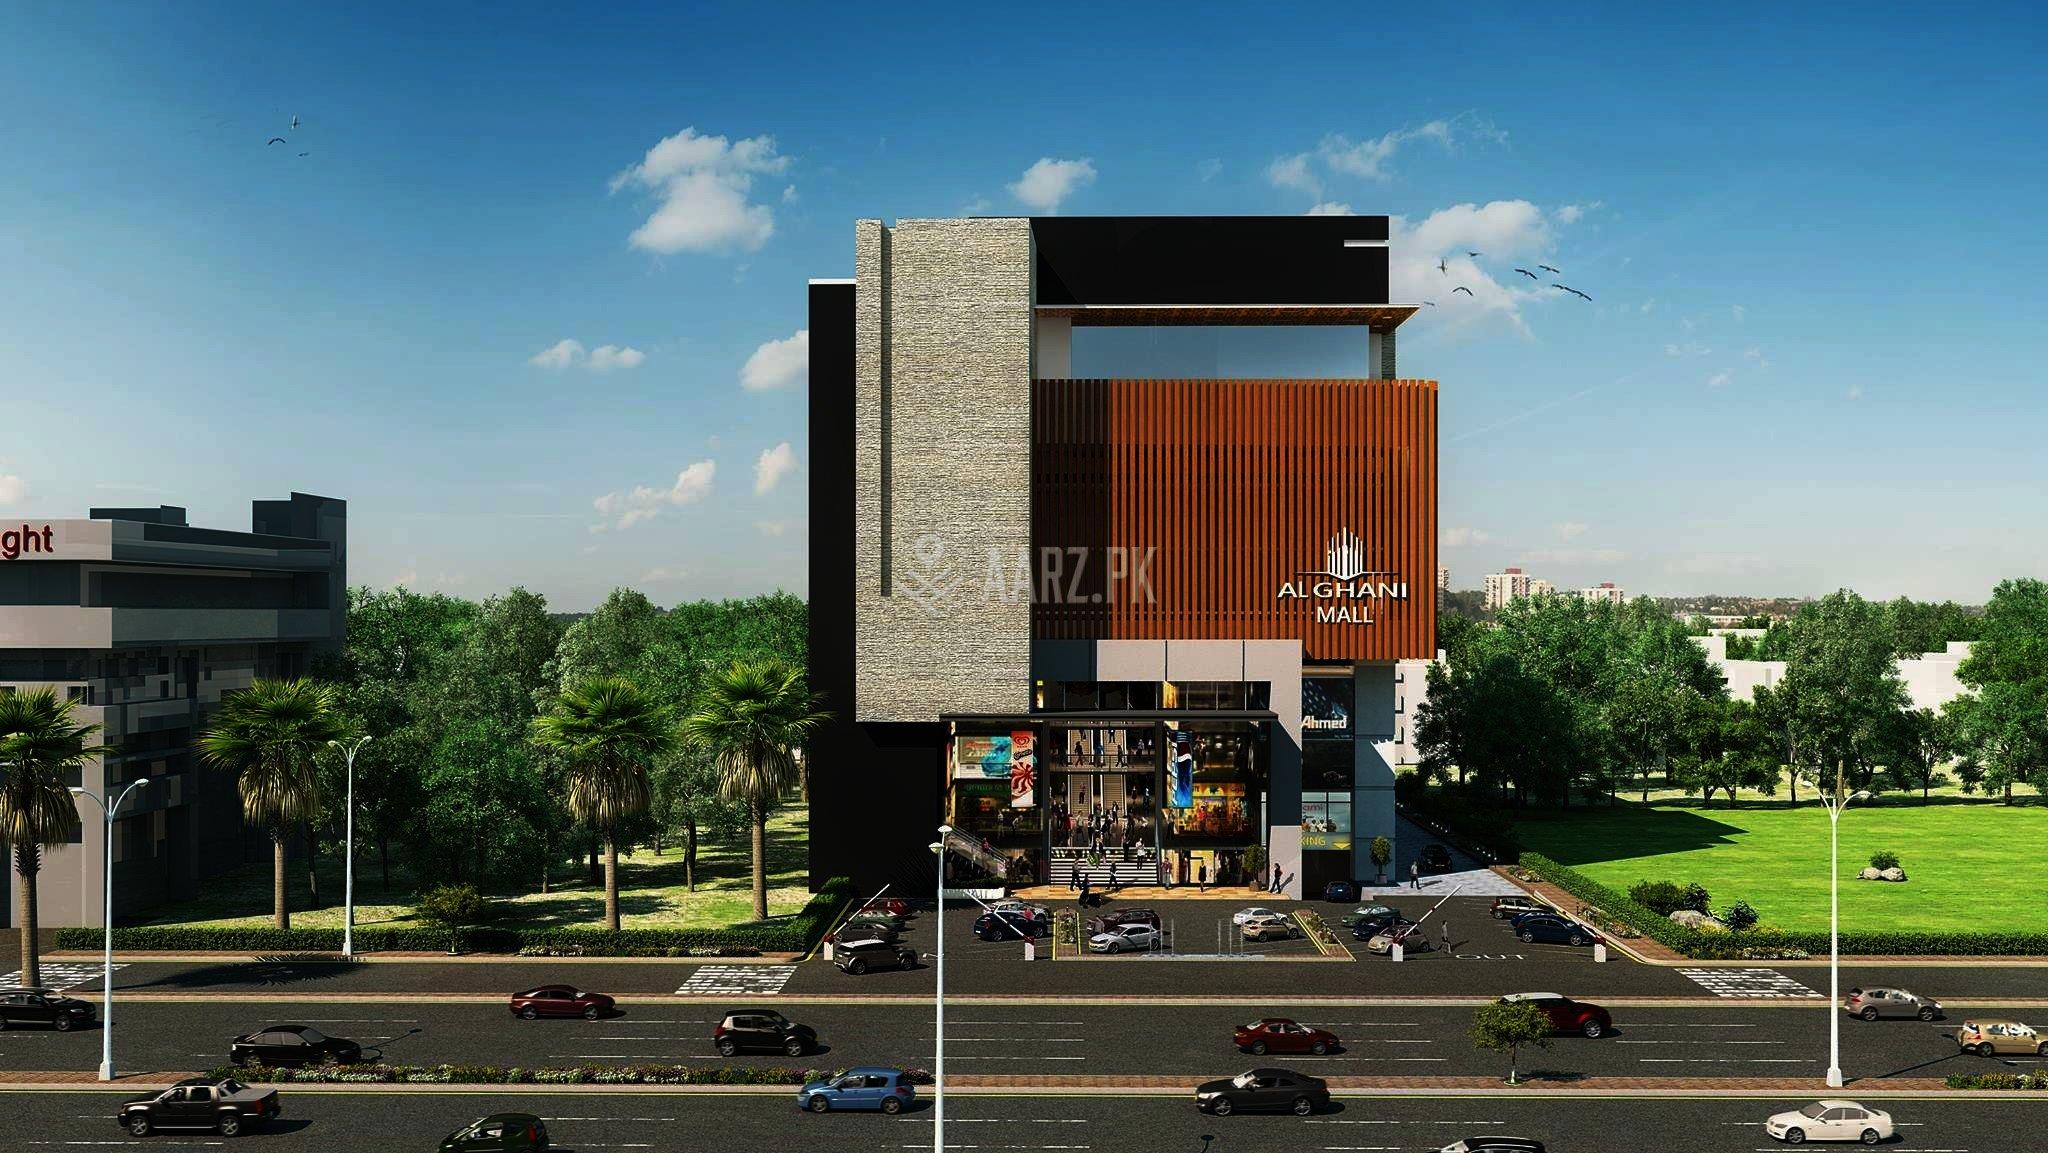 al-ghani-mall